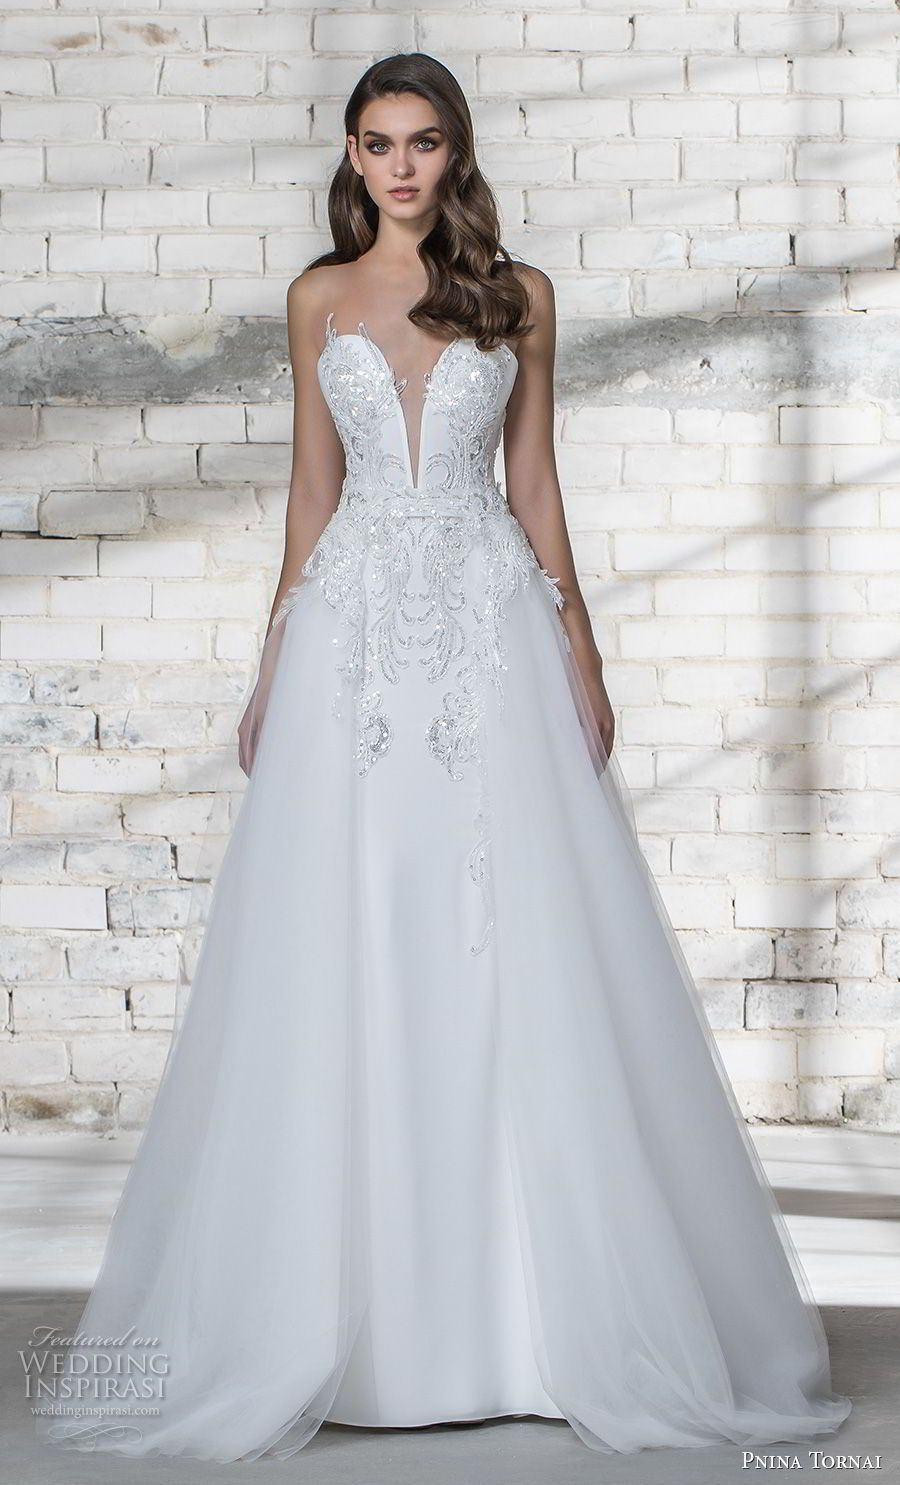 pnina tornai 2019 love bridal strapless deep plunging sweetheart ...